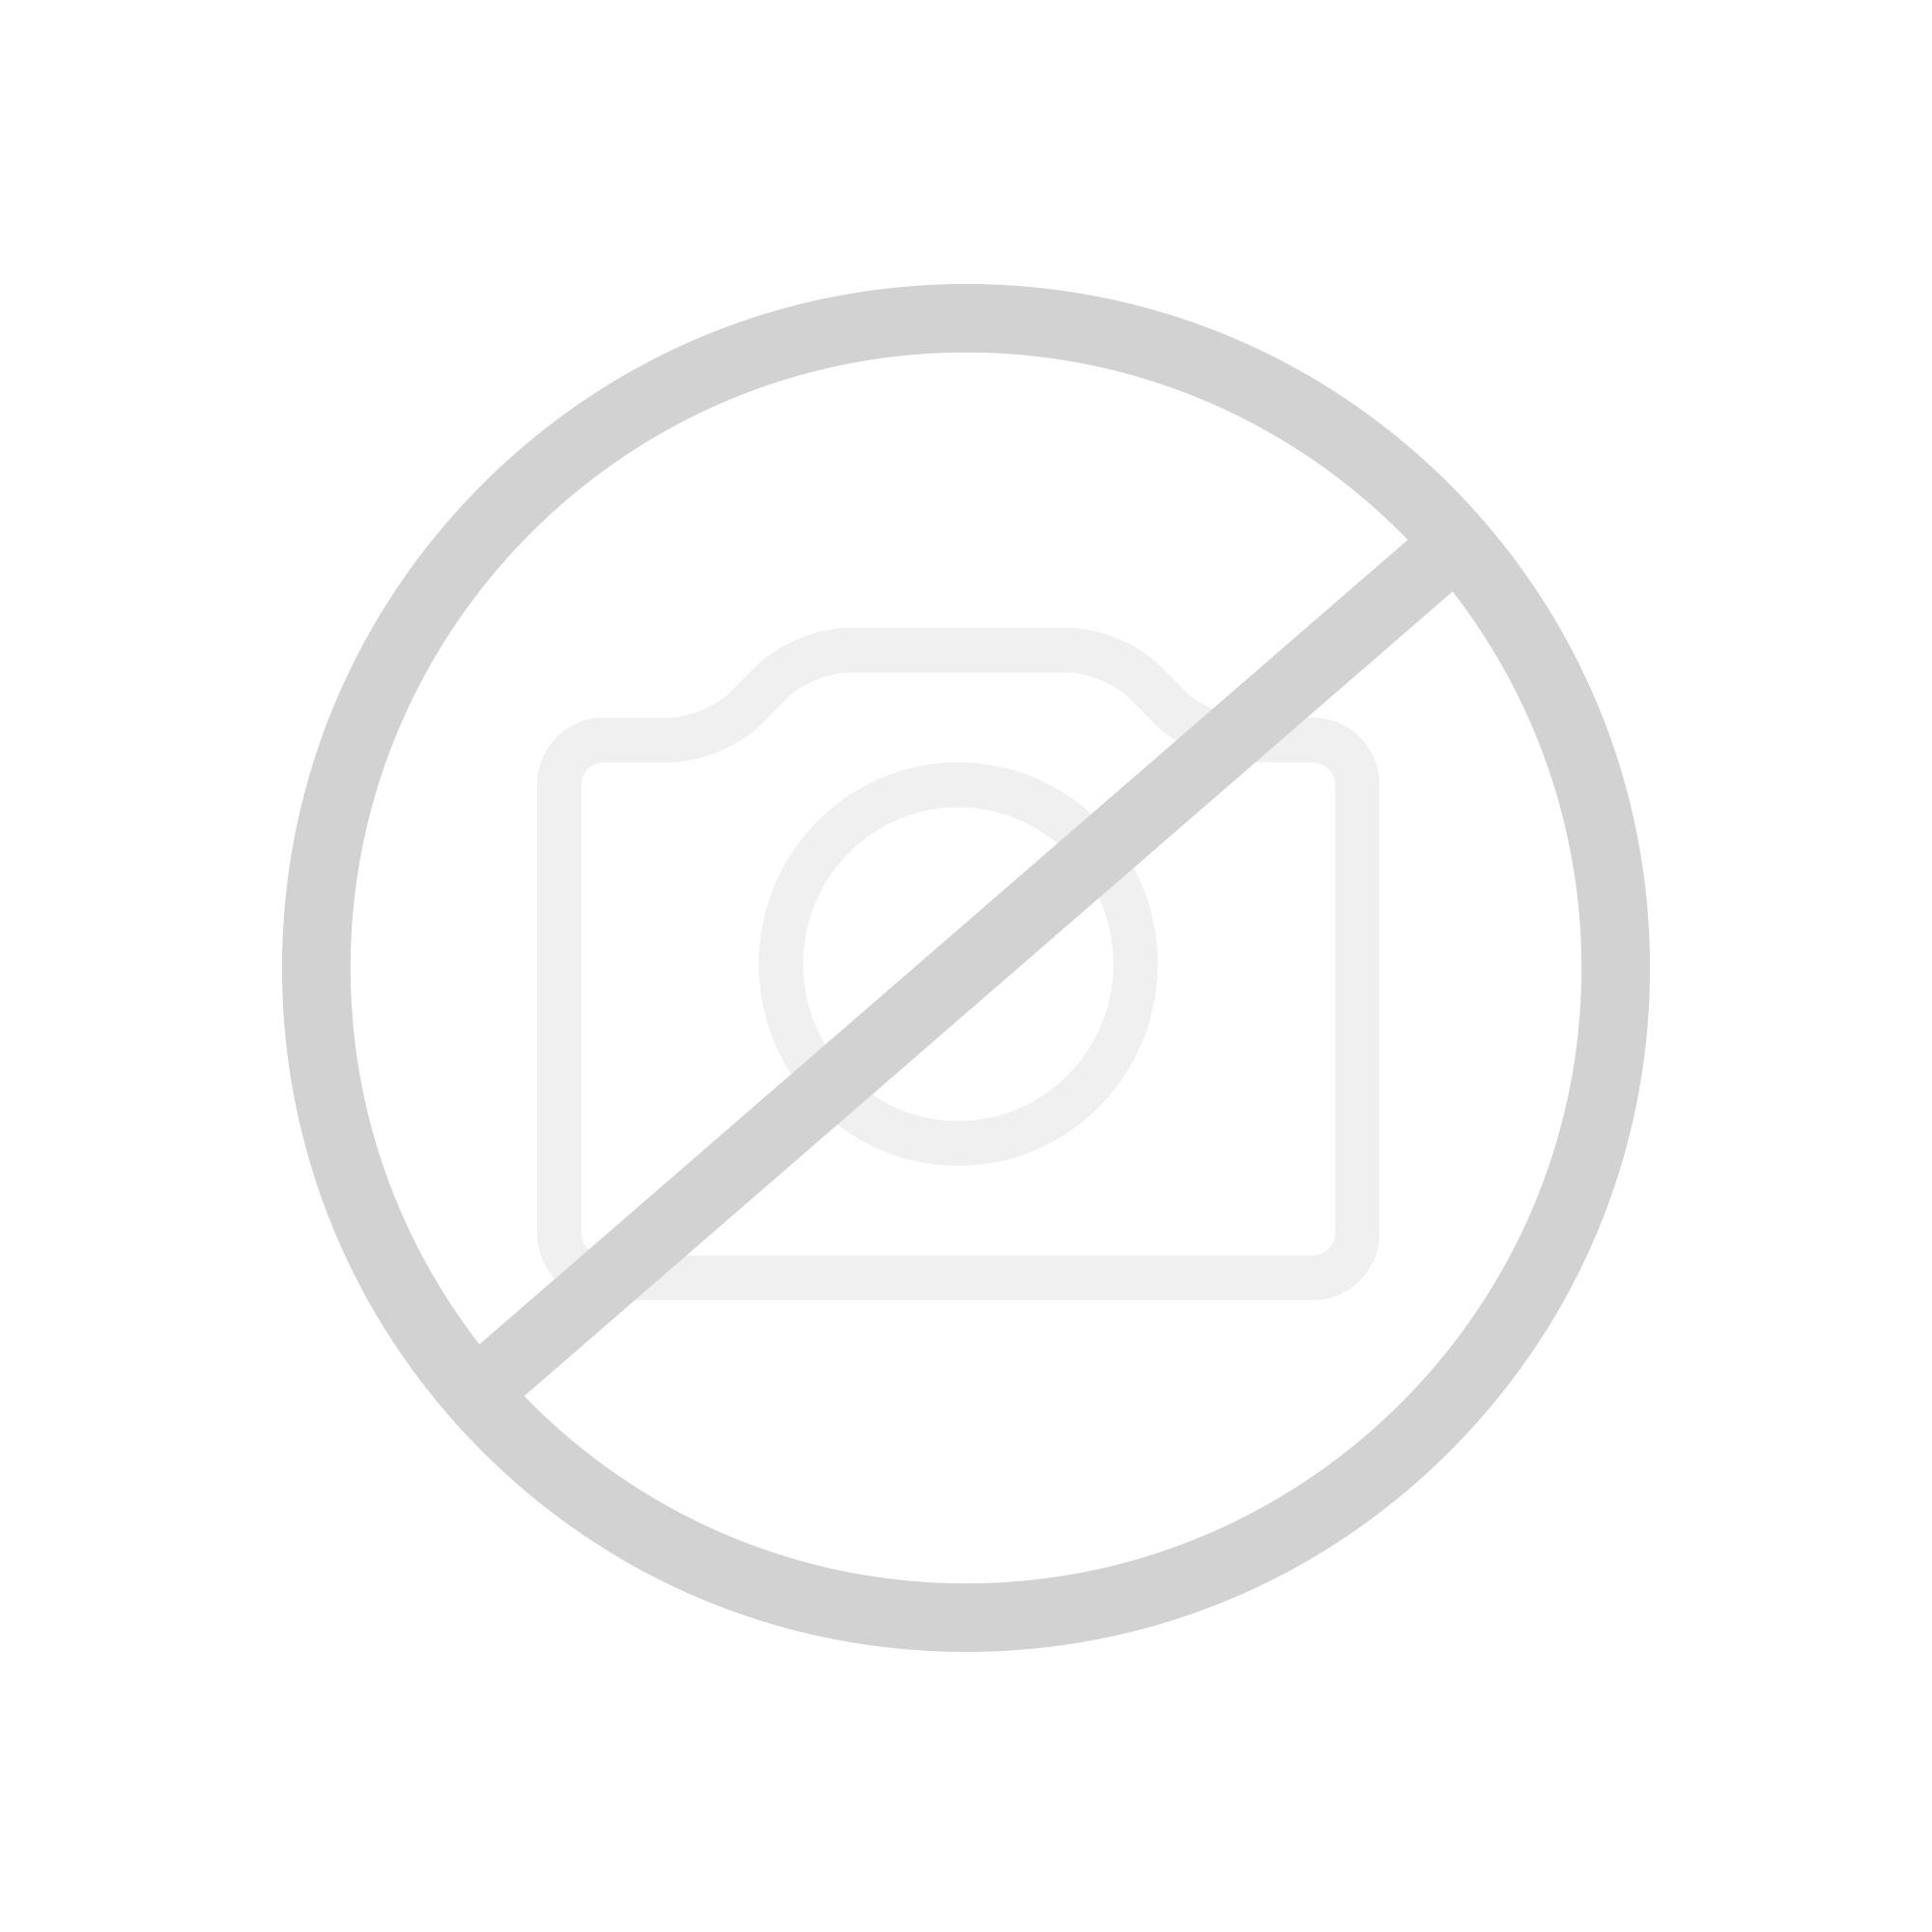 Grohe Rapido T Unterputz-Universal-Thermostatbatterie